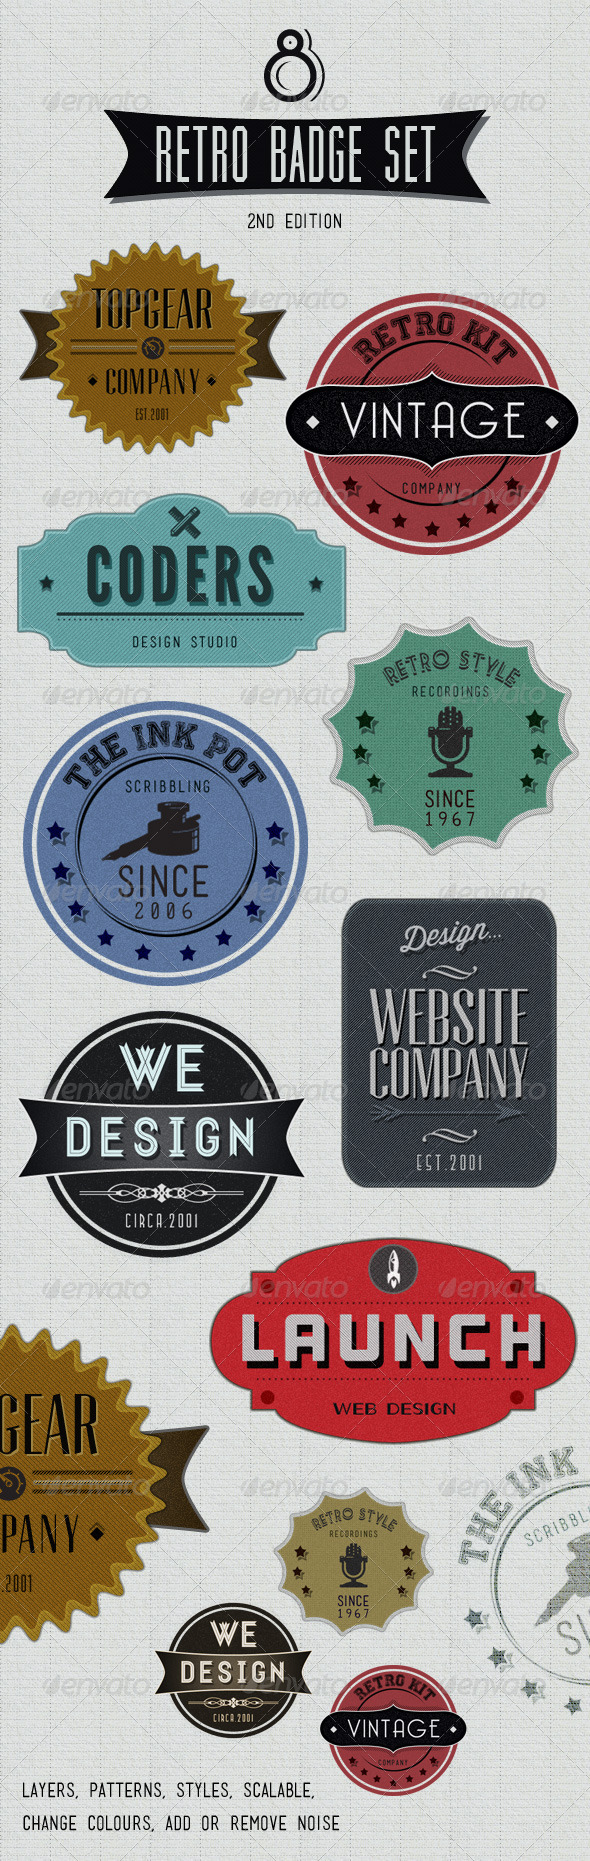 Graphic River Retro Badges Faded Vintage Labels V.2 Web Elements -  Badges & Stickers 1402787